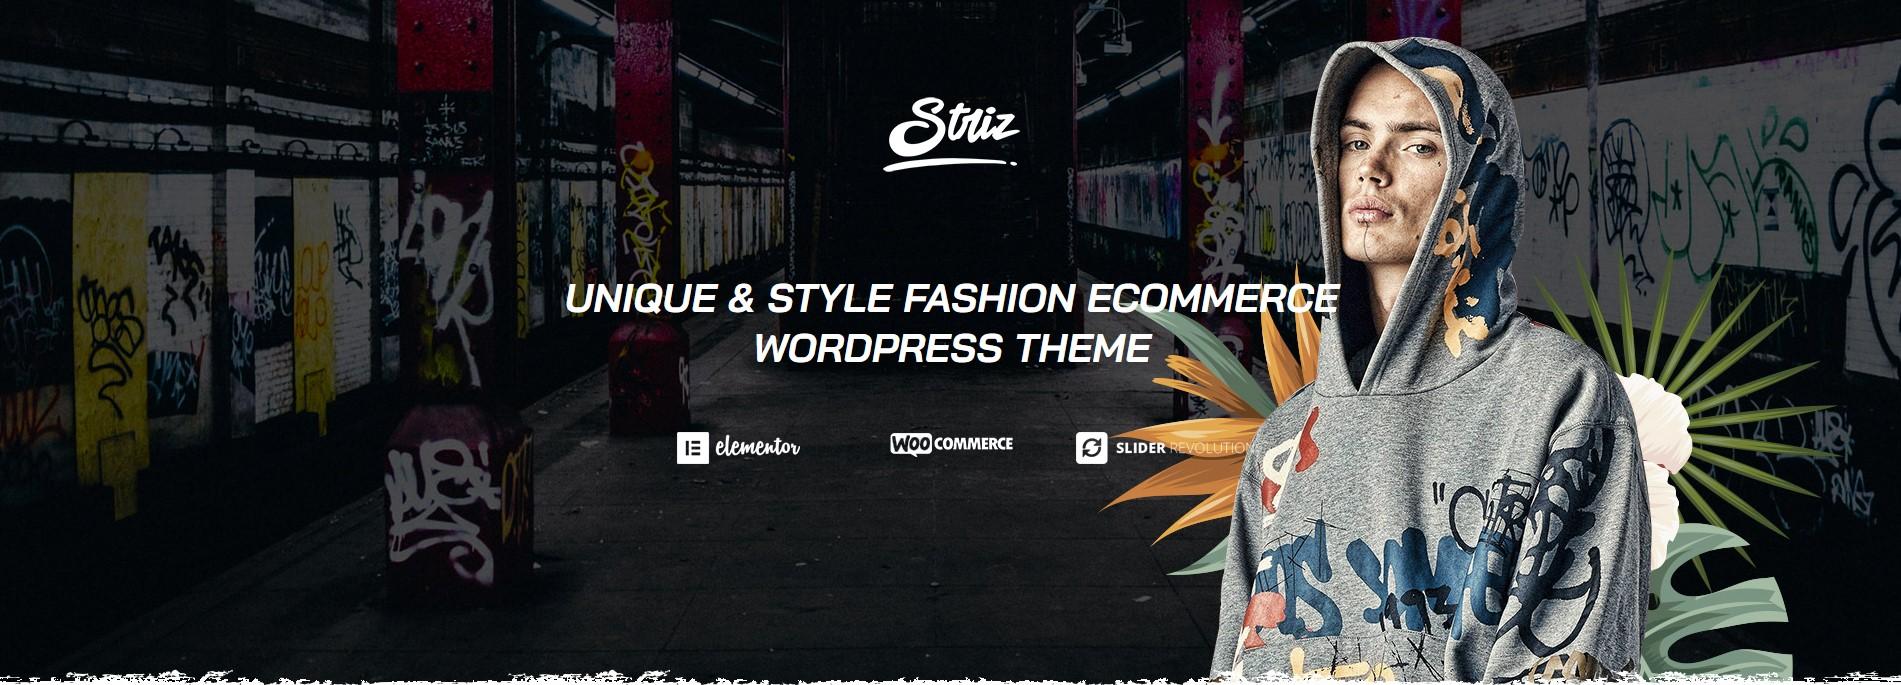 striz stress fashion wordpress theme